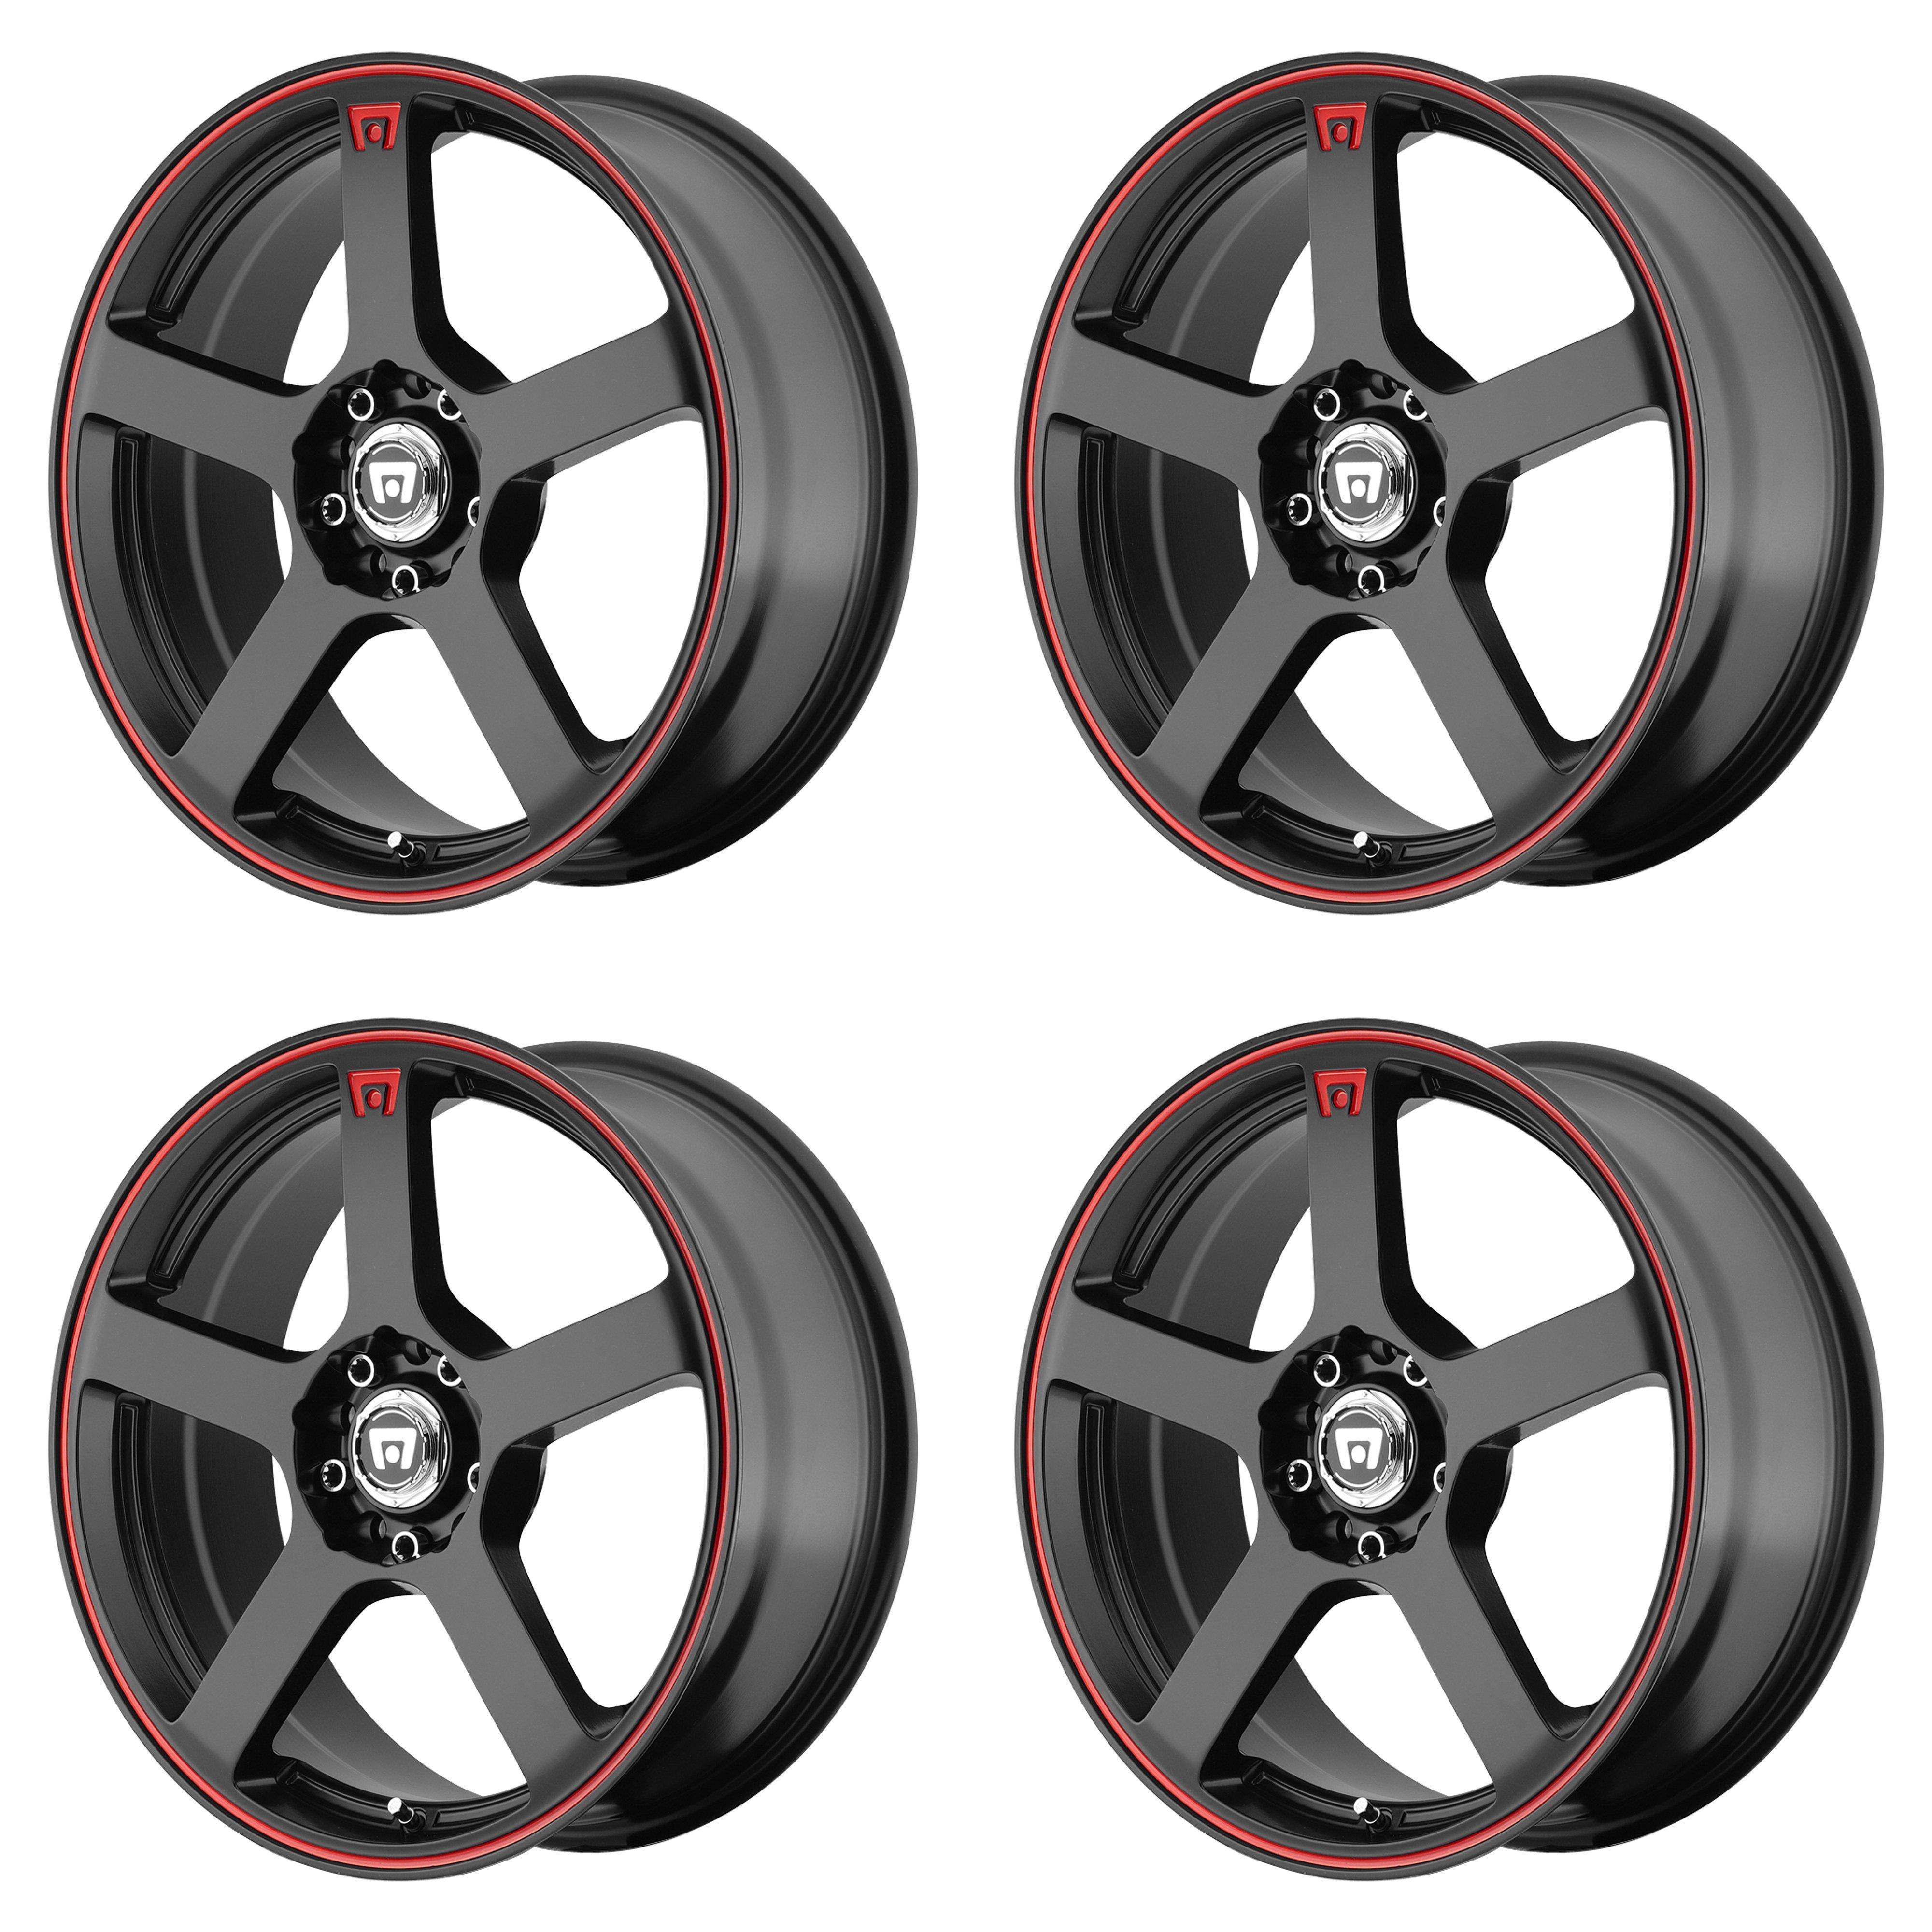 "35mm 5.88/"" Motegi 18x8 MR116 Wheel Matte Black Red Stripe 5x4.5 5x100 5x114.3"